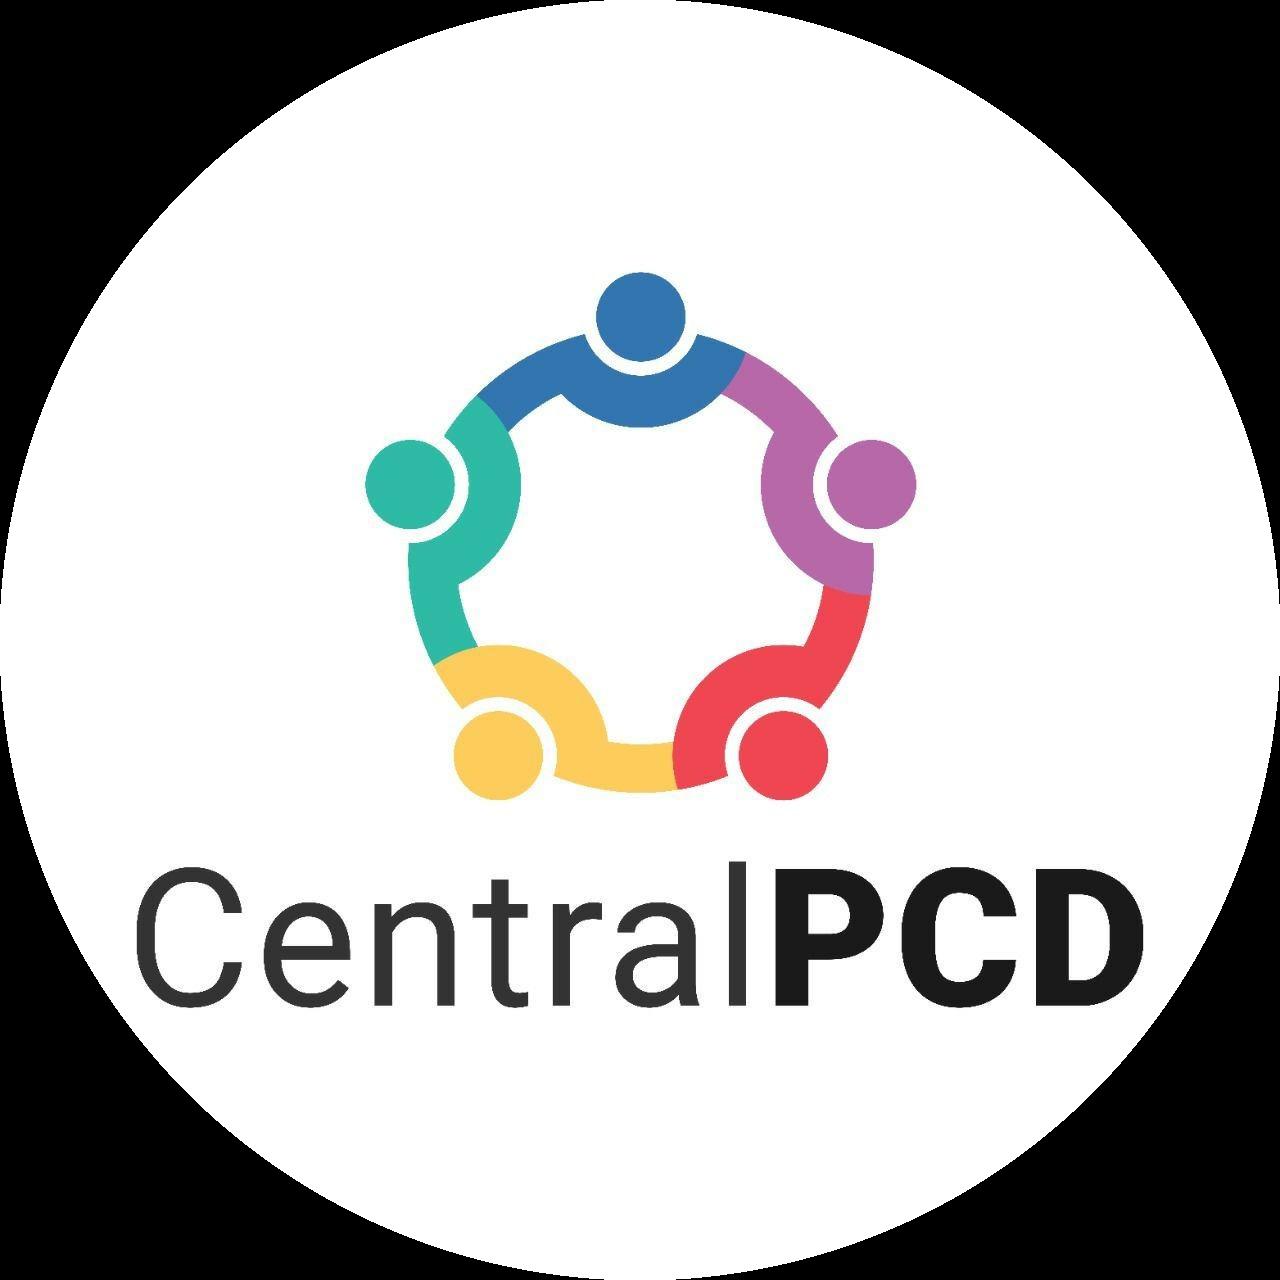 @centralpcd Profile Image | Linktree